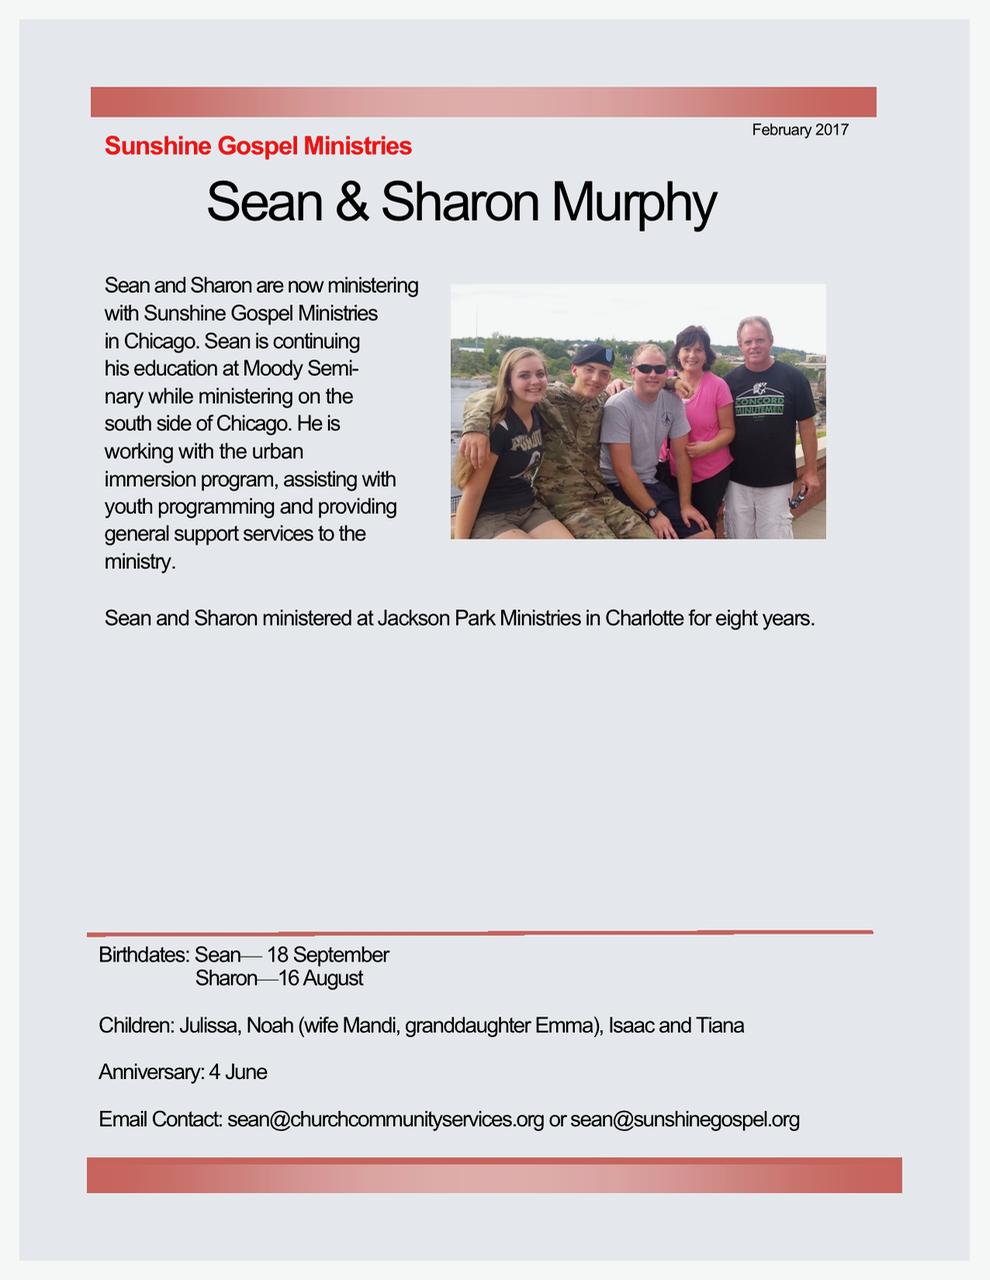 Sean and Sharon Murphy